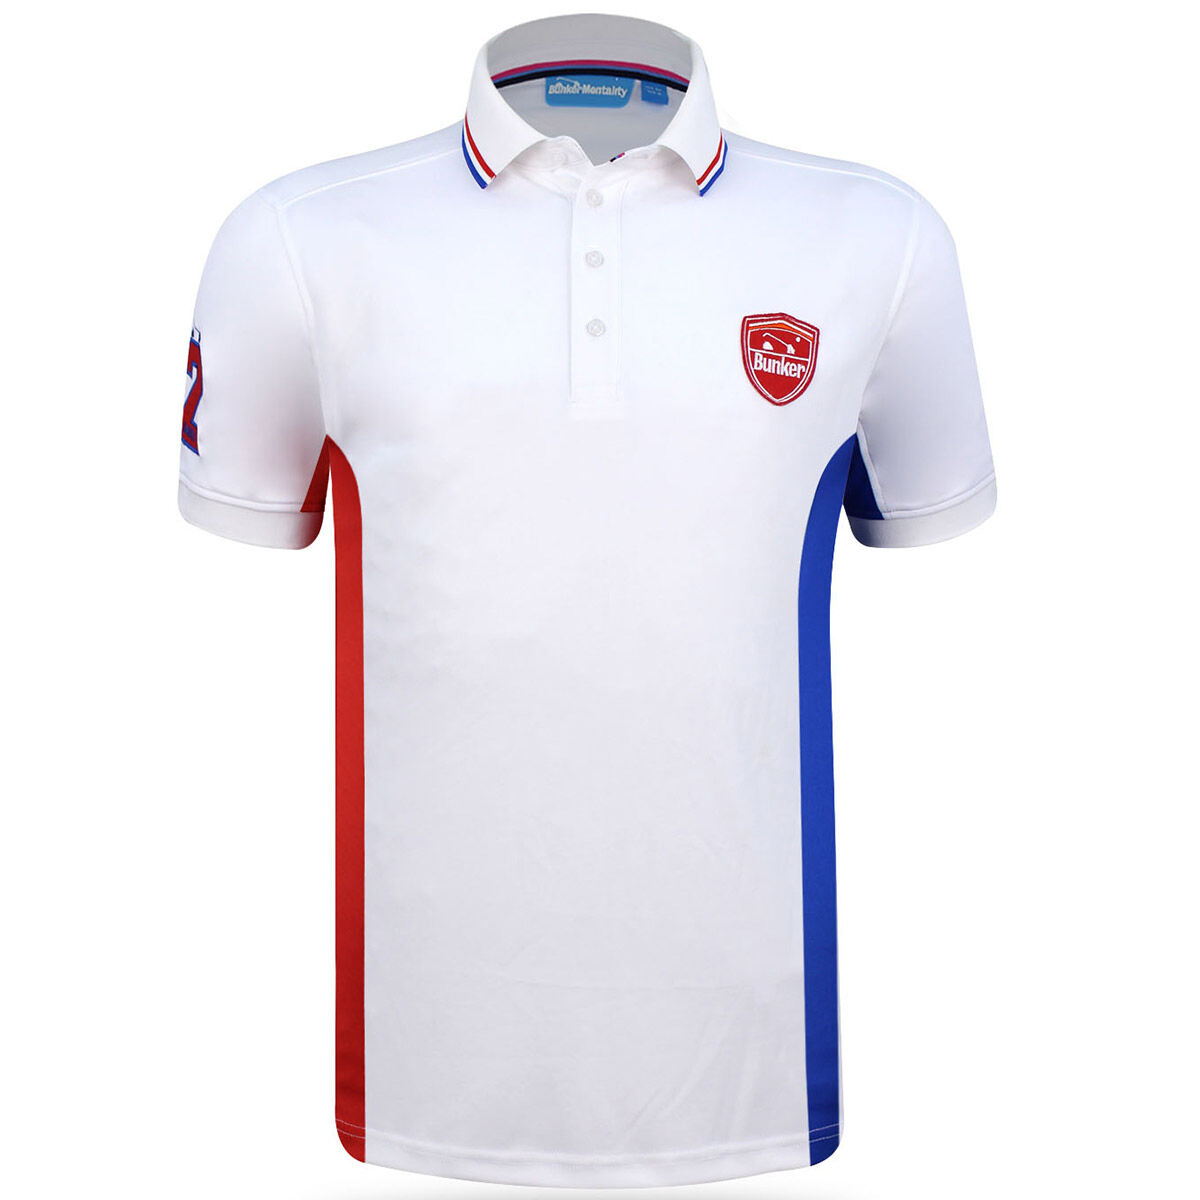 216da2e7 Bunker mentality side stripe polo shirt from american golf jpg 635x635 Polo  shirt side